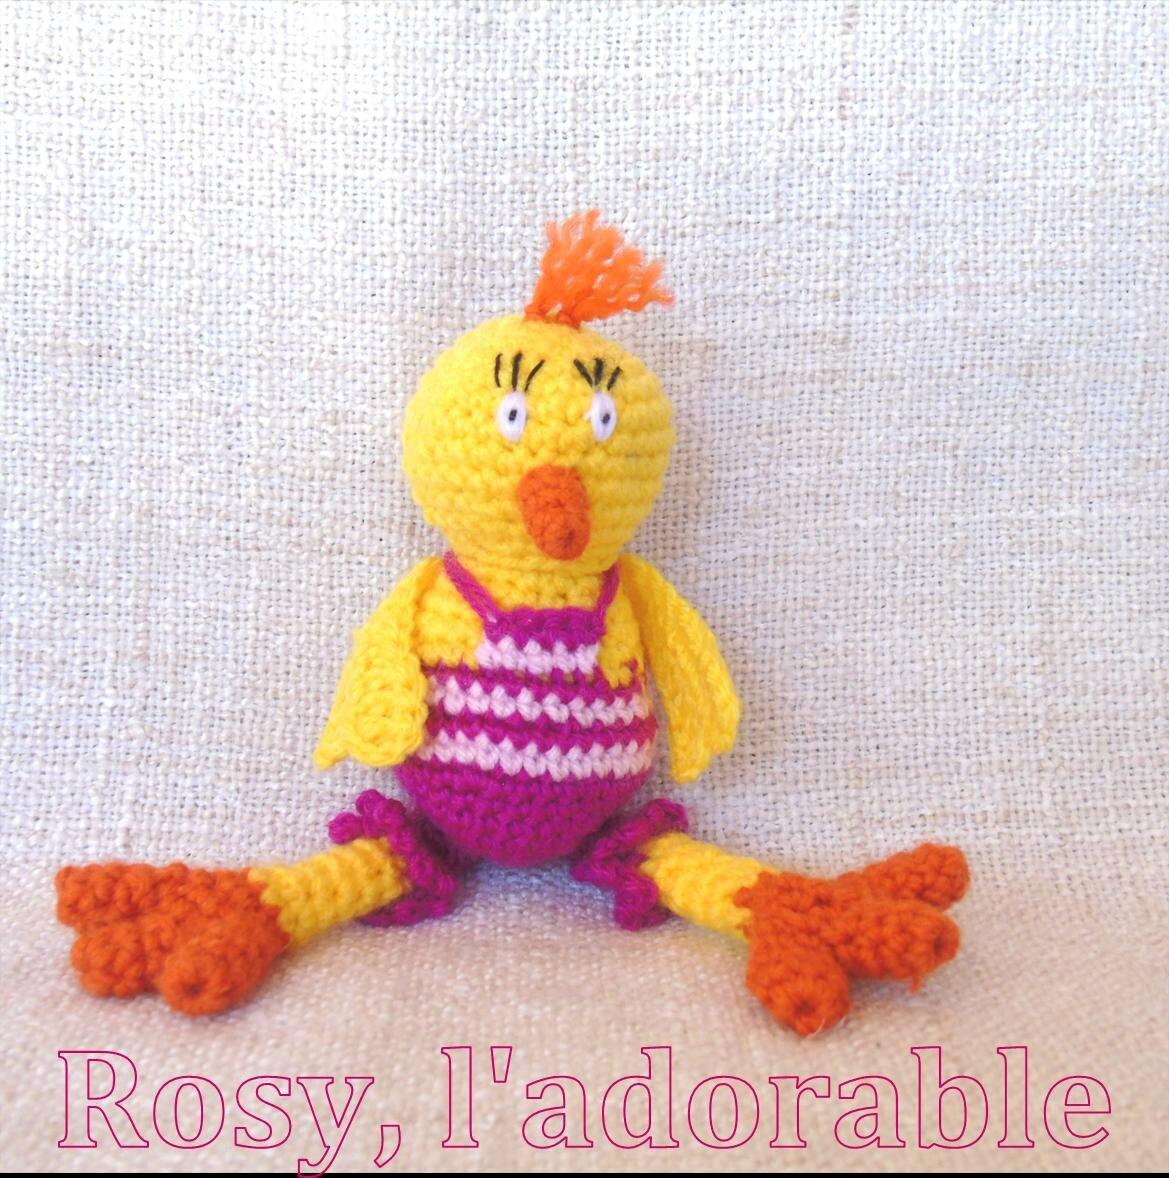 rosy-poussin-crochet